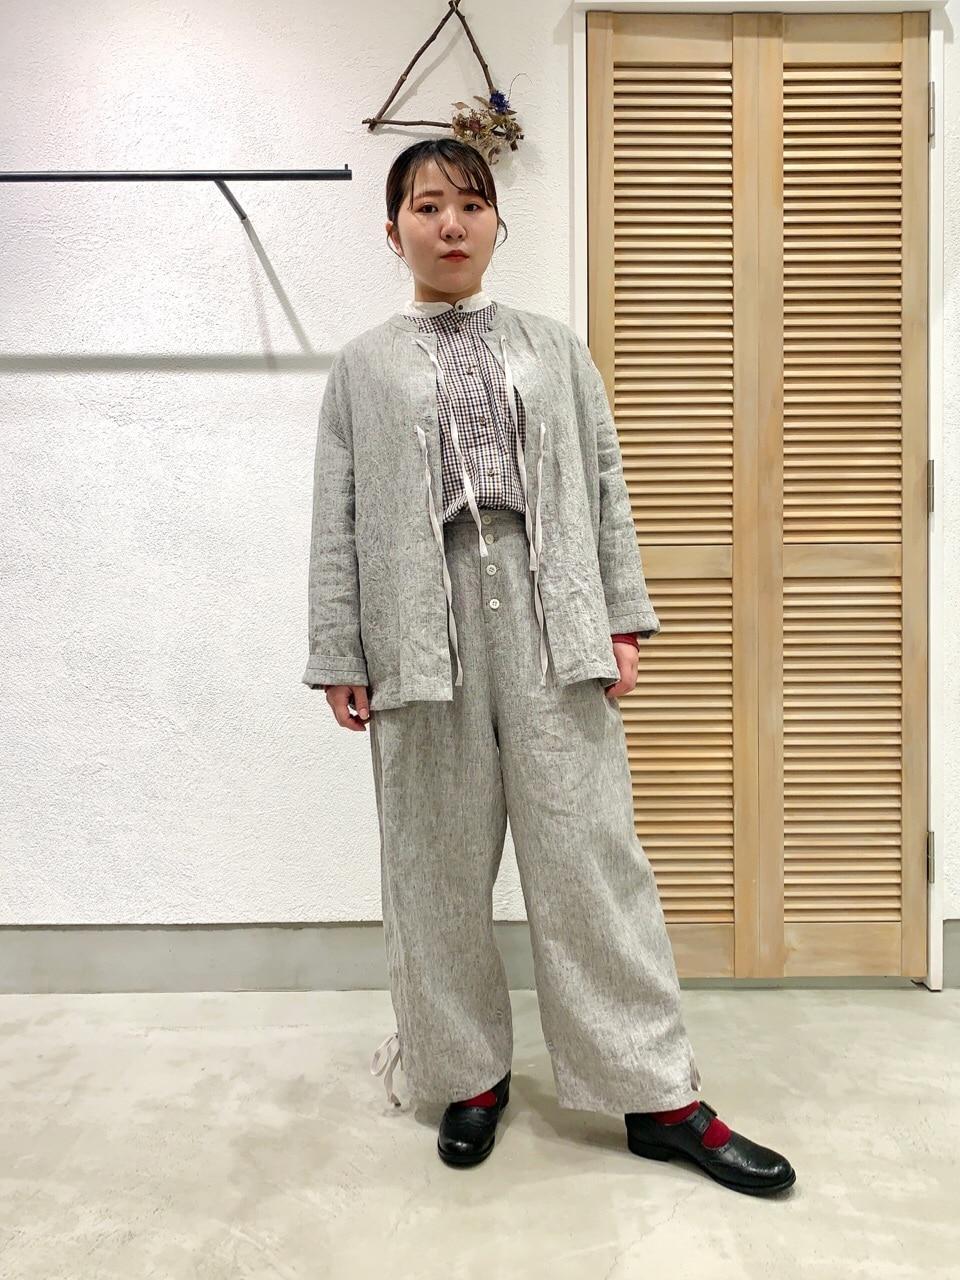 chambre de charme 横浜ジョイナス 身長:155cm 2021.04.09